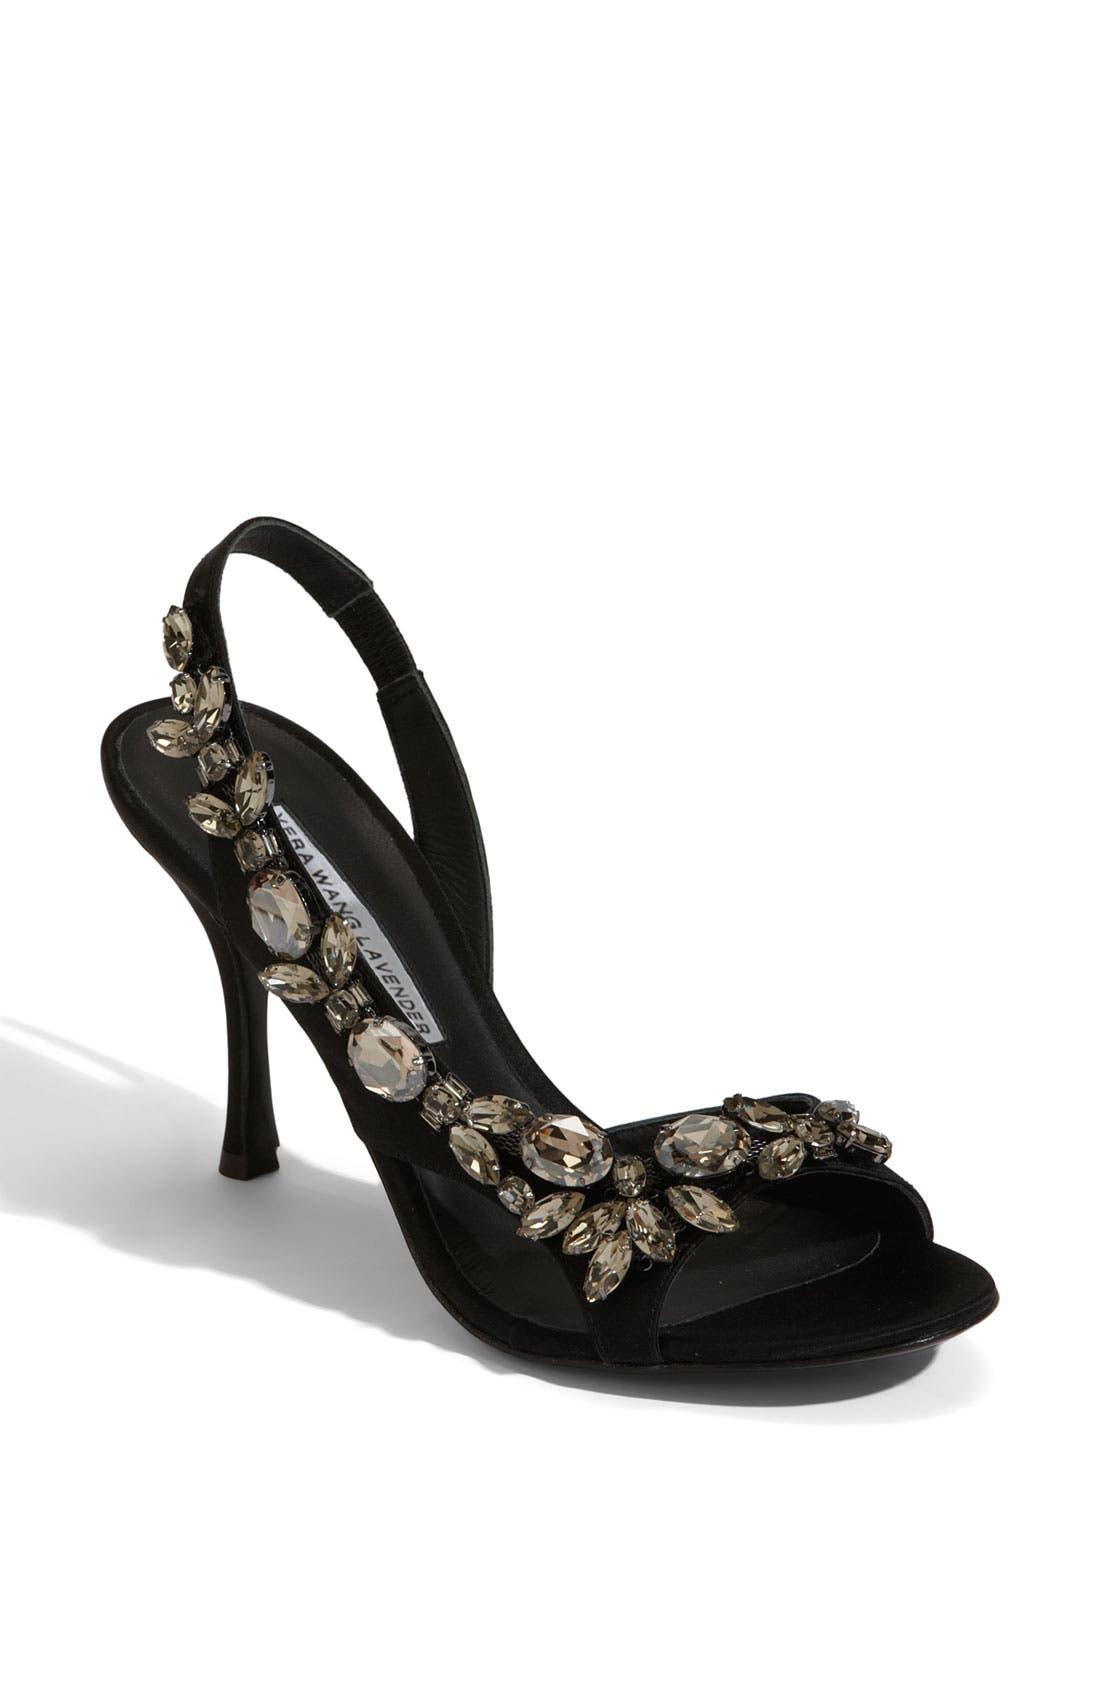 Alternate Image 1 Selected - Vera Wang Lavender 'Elizabeth' Sandal